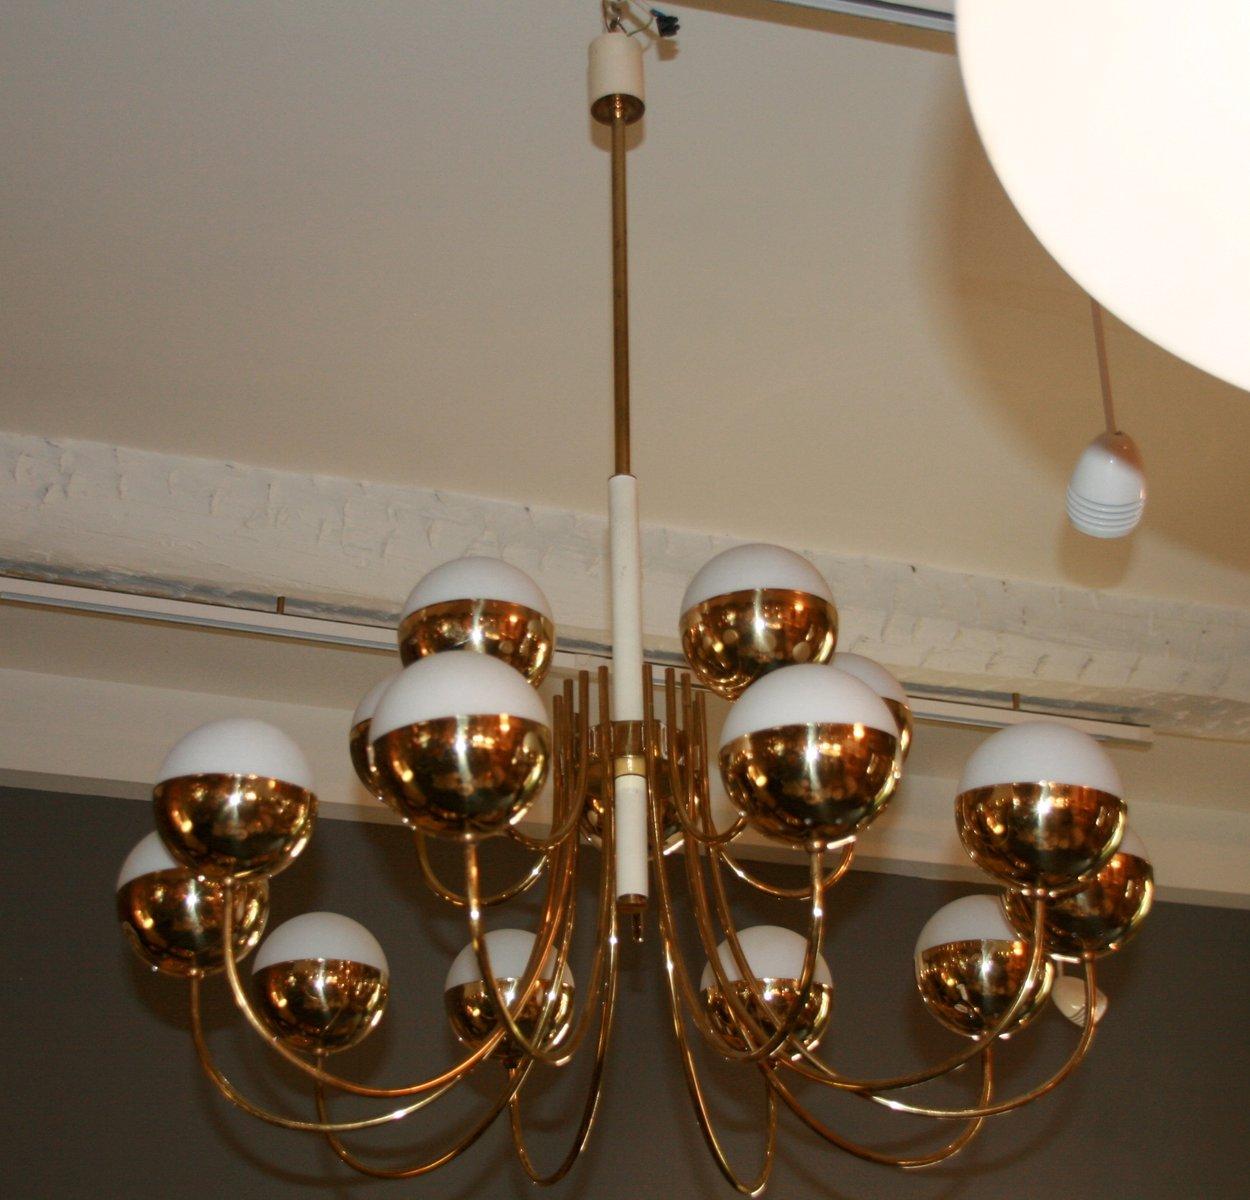 italienischer kronleuchter aus glas vergoldetem messing. Black Bedroom Furniture Sets. Home Design Ideas